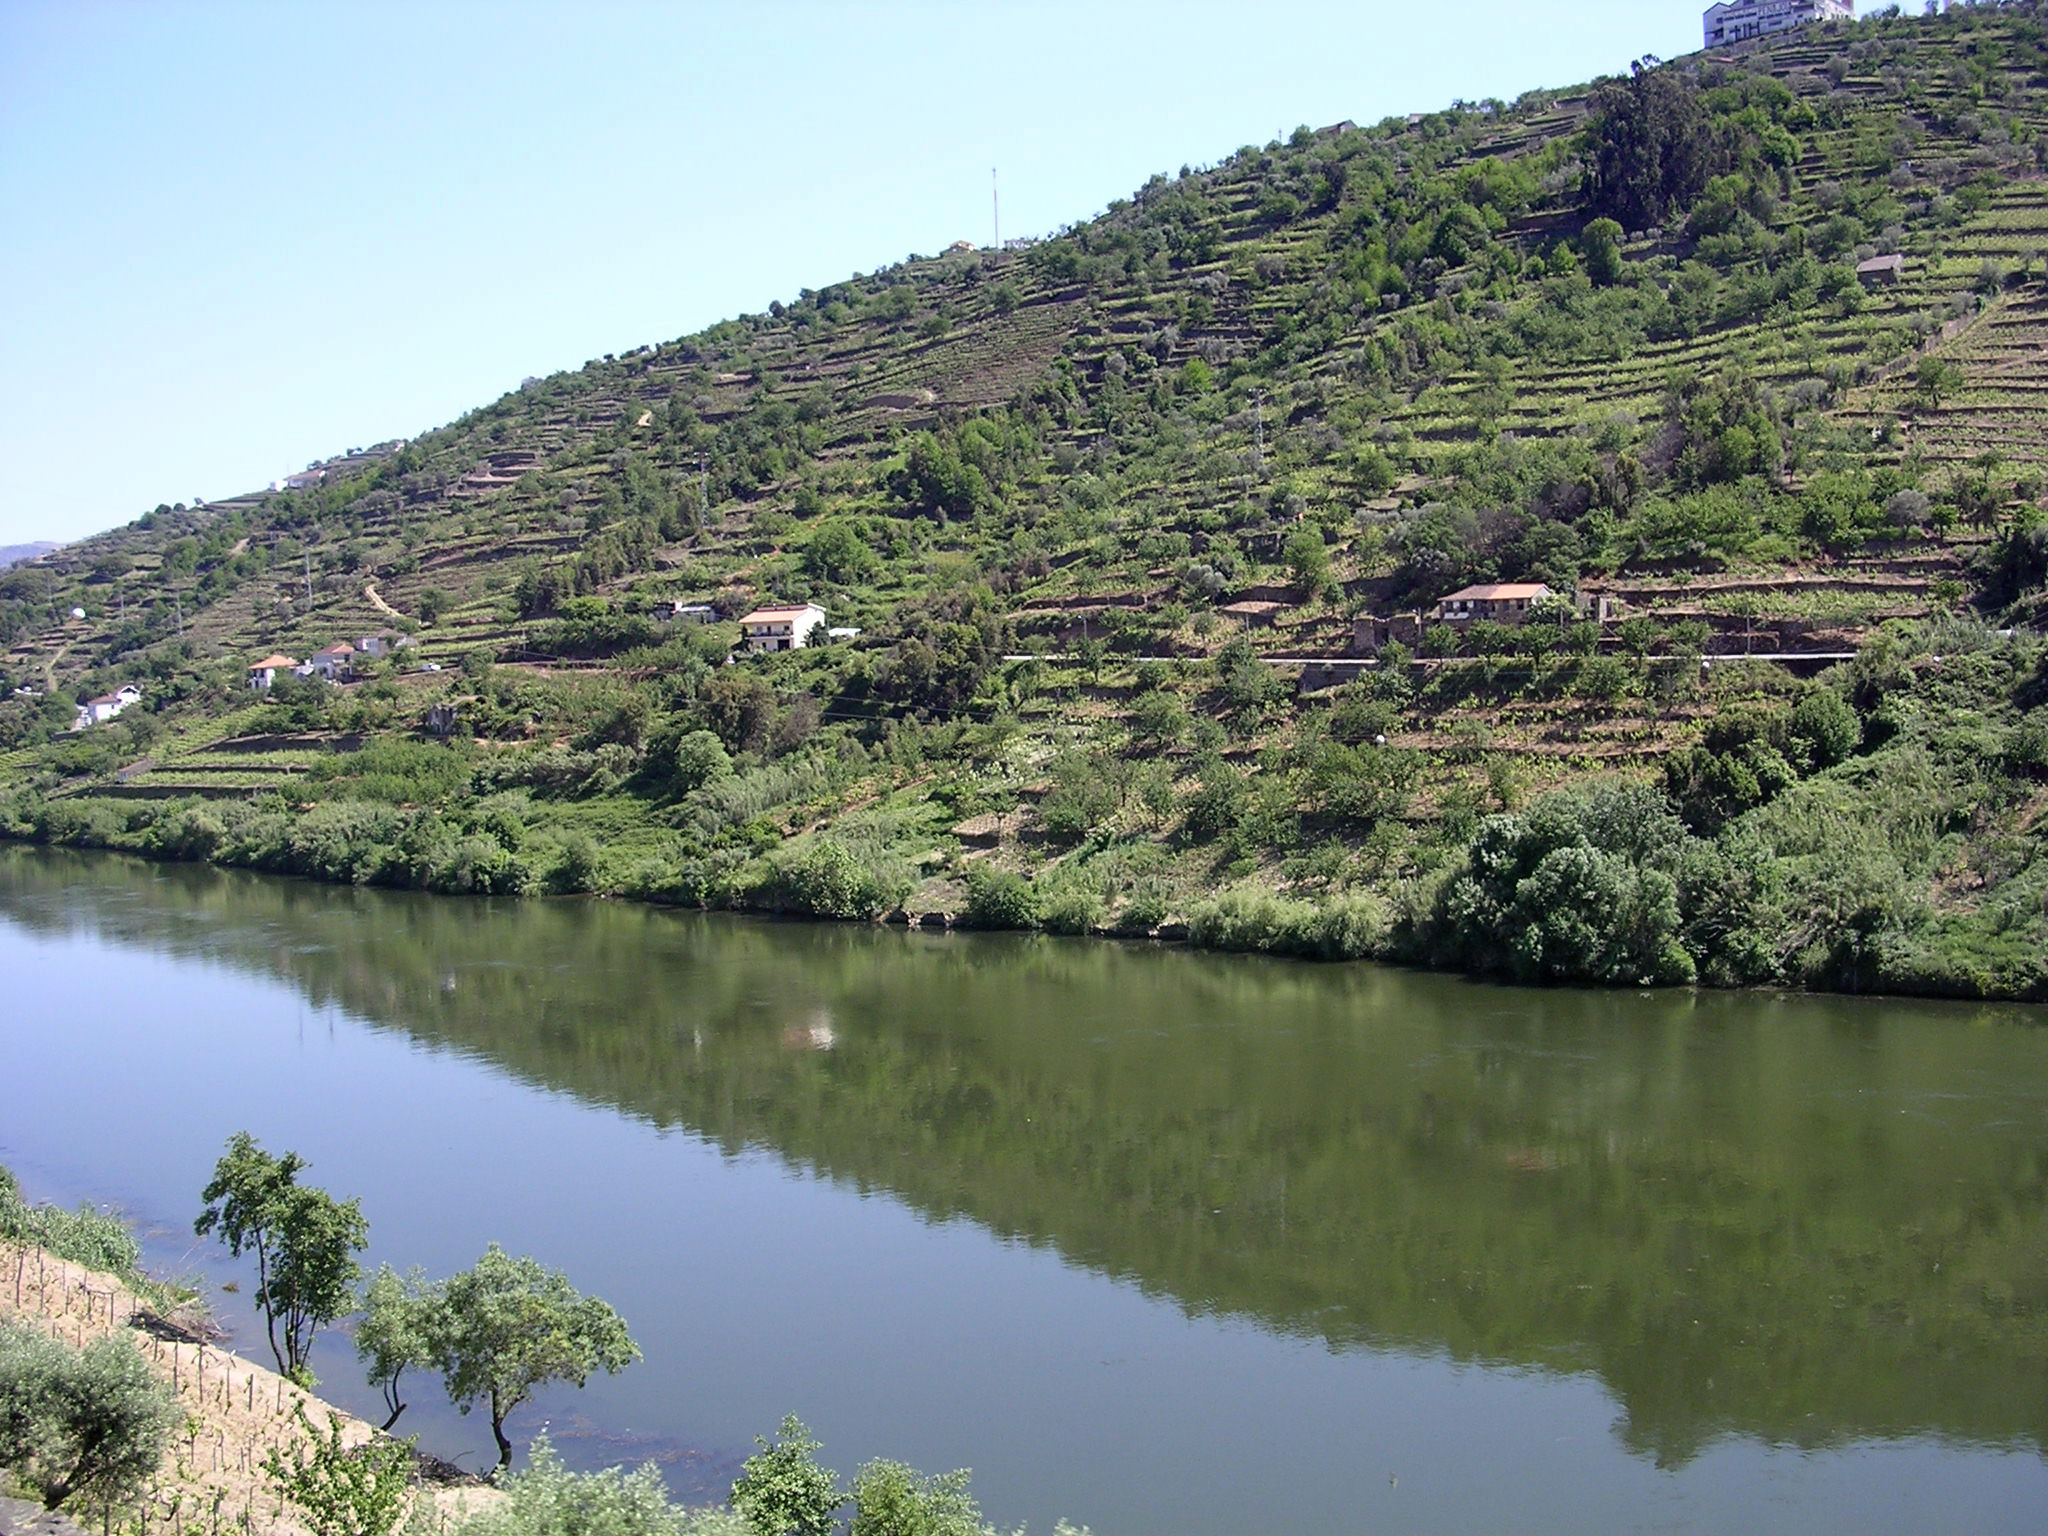 https://upload.wikimedia.org/wikipedia/commons/4/44/Douro-river-oliv.jpg